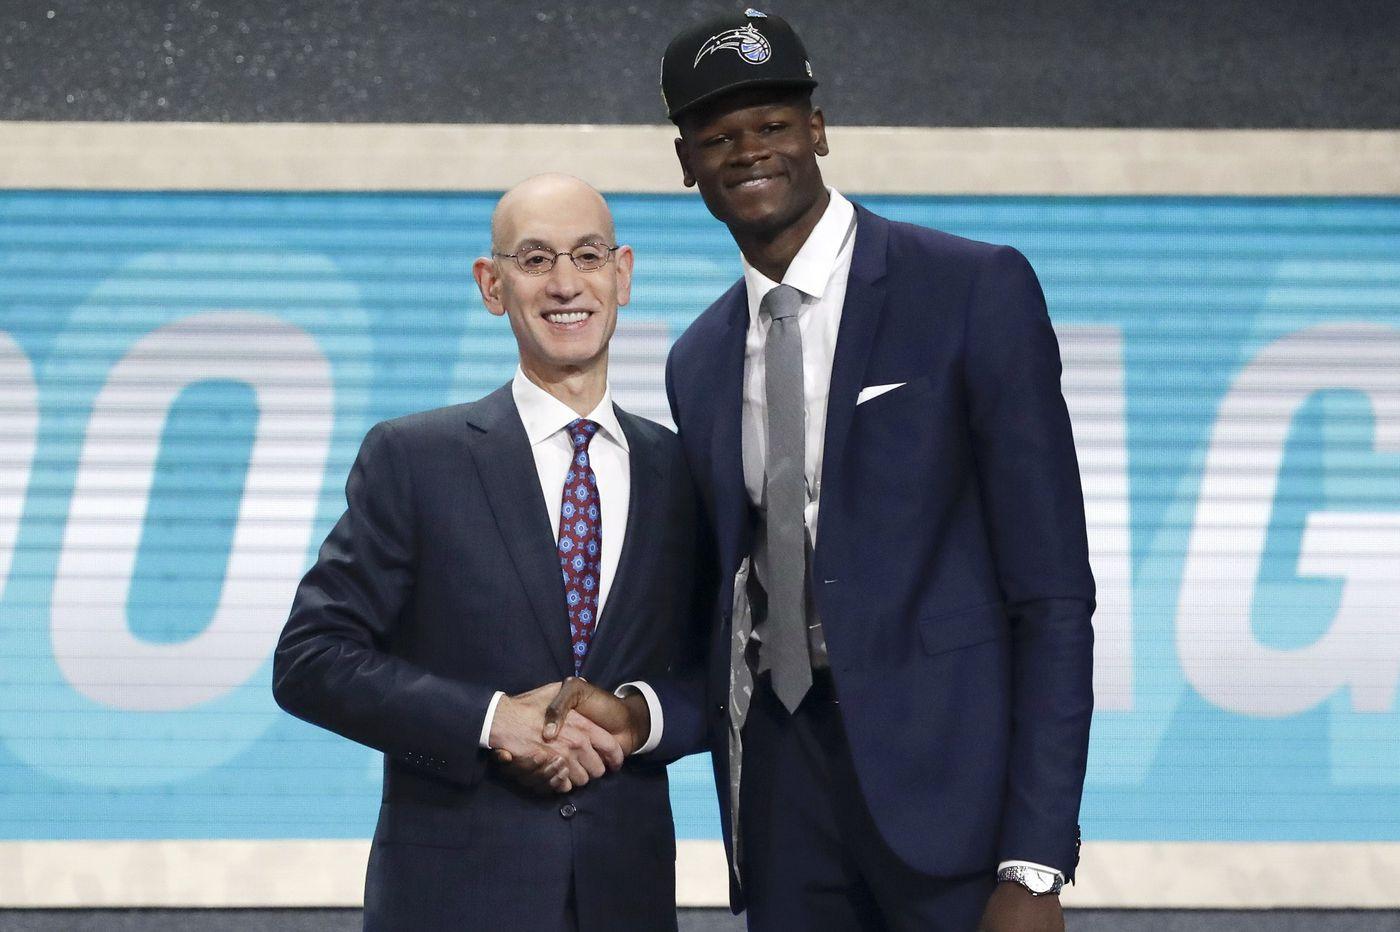 Mo Bamba, Lonnie Walker headline NBA draft full of Philadelphia-area talent